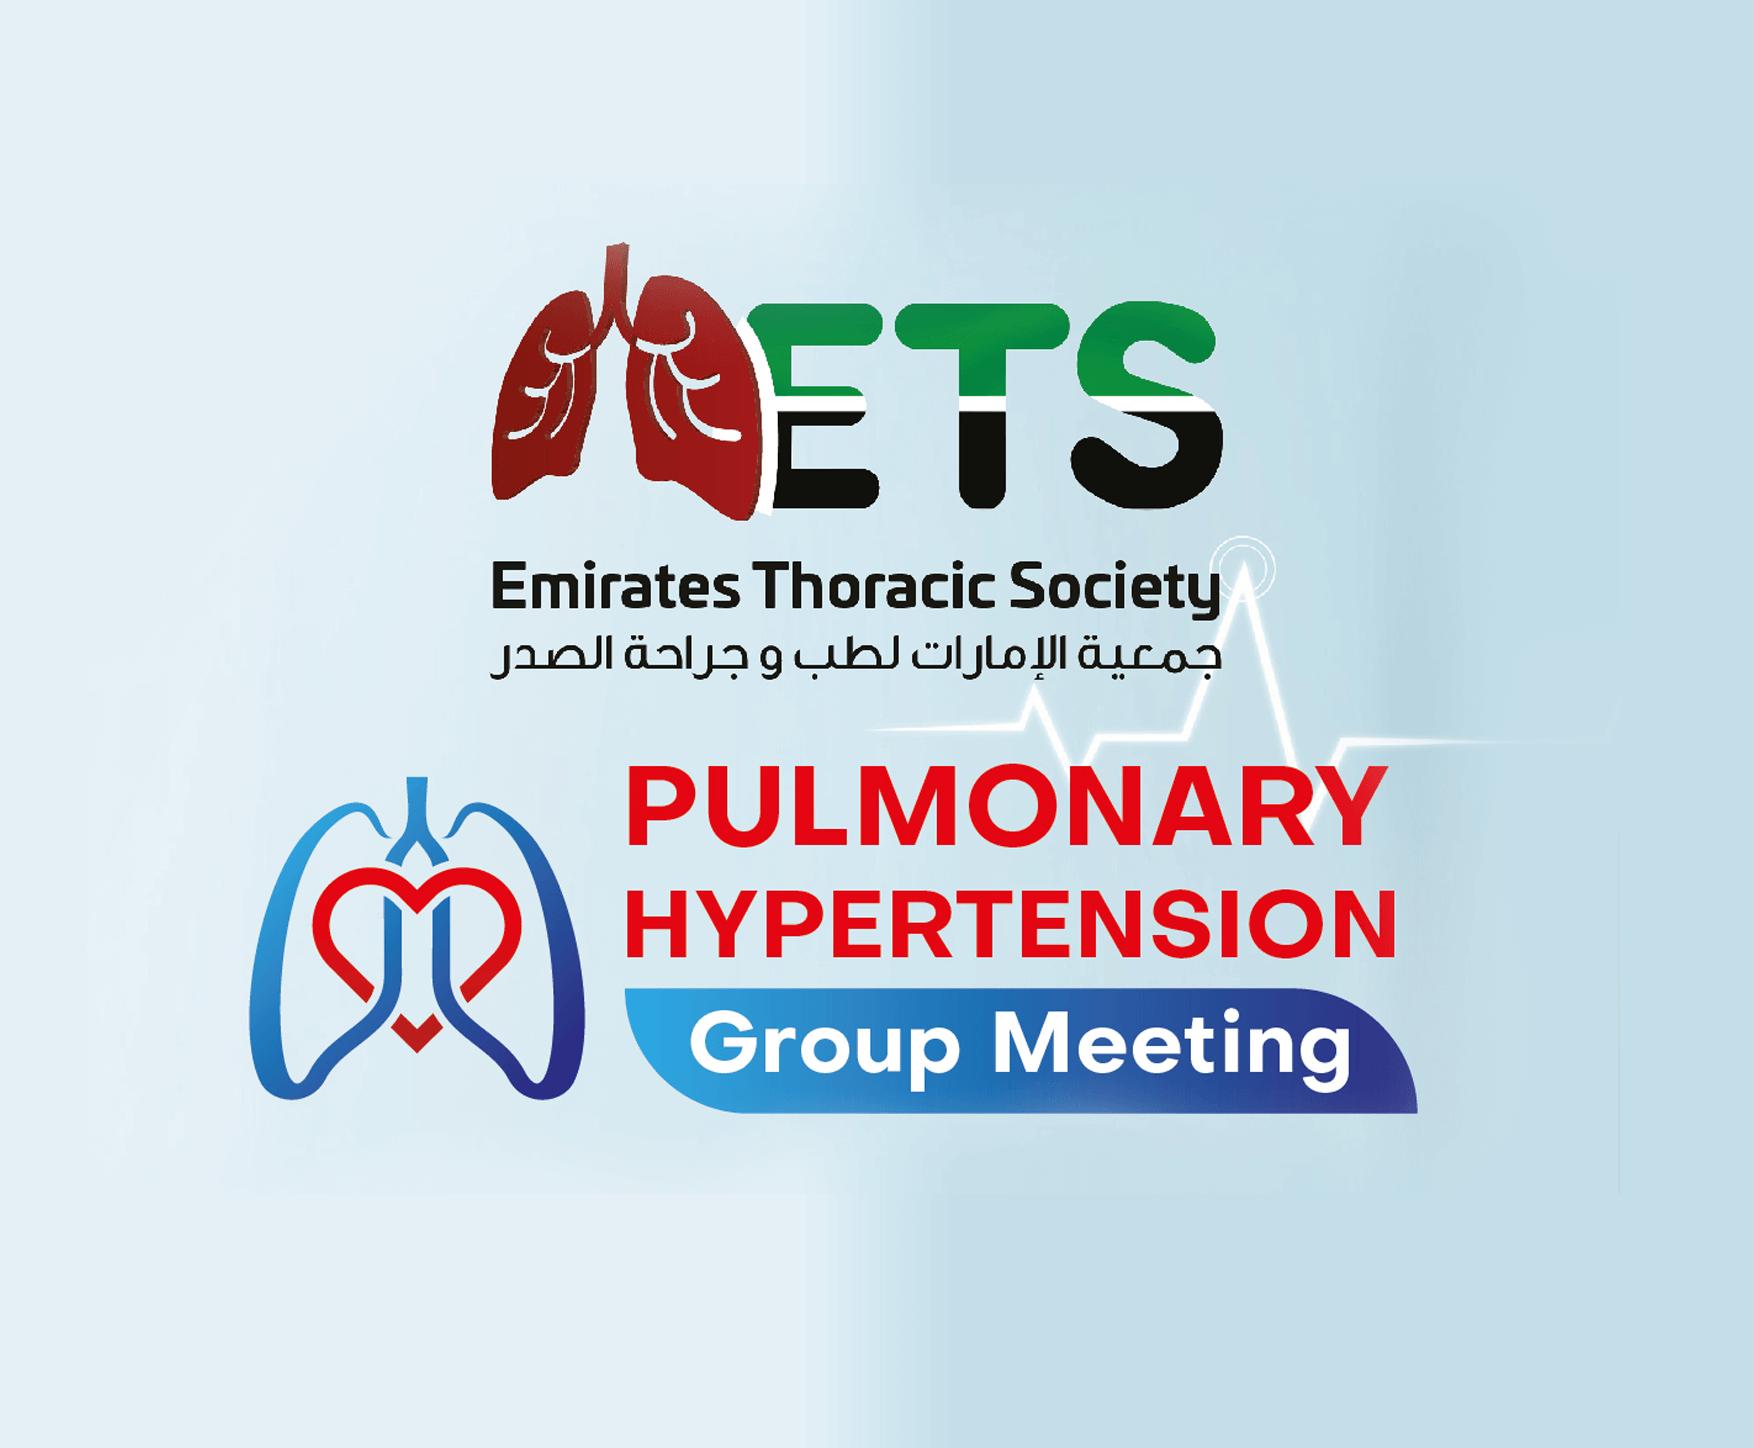 ETS Pulmonary Hypertension Group Meeting